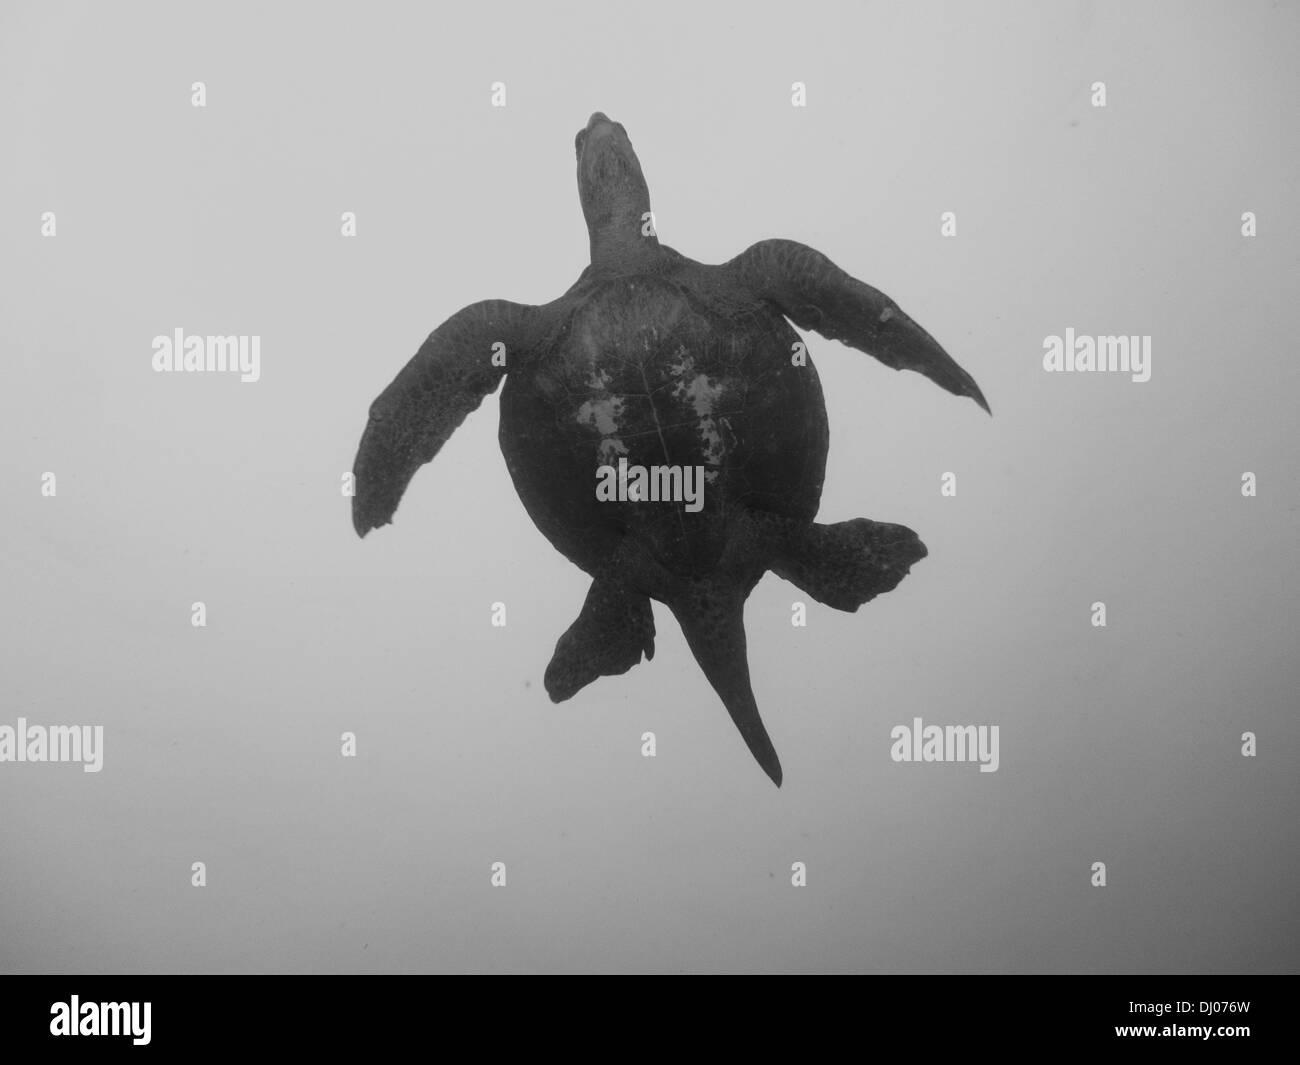 underwater, Costa Rica, Cocos Island, turtle, black and white, ocean, sea, scuba, diving, marine life, sea life - Stock Image